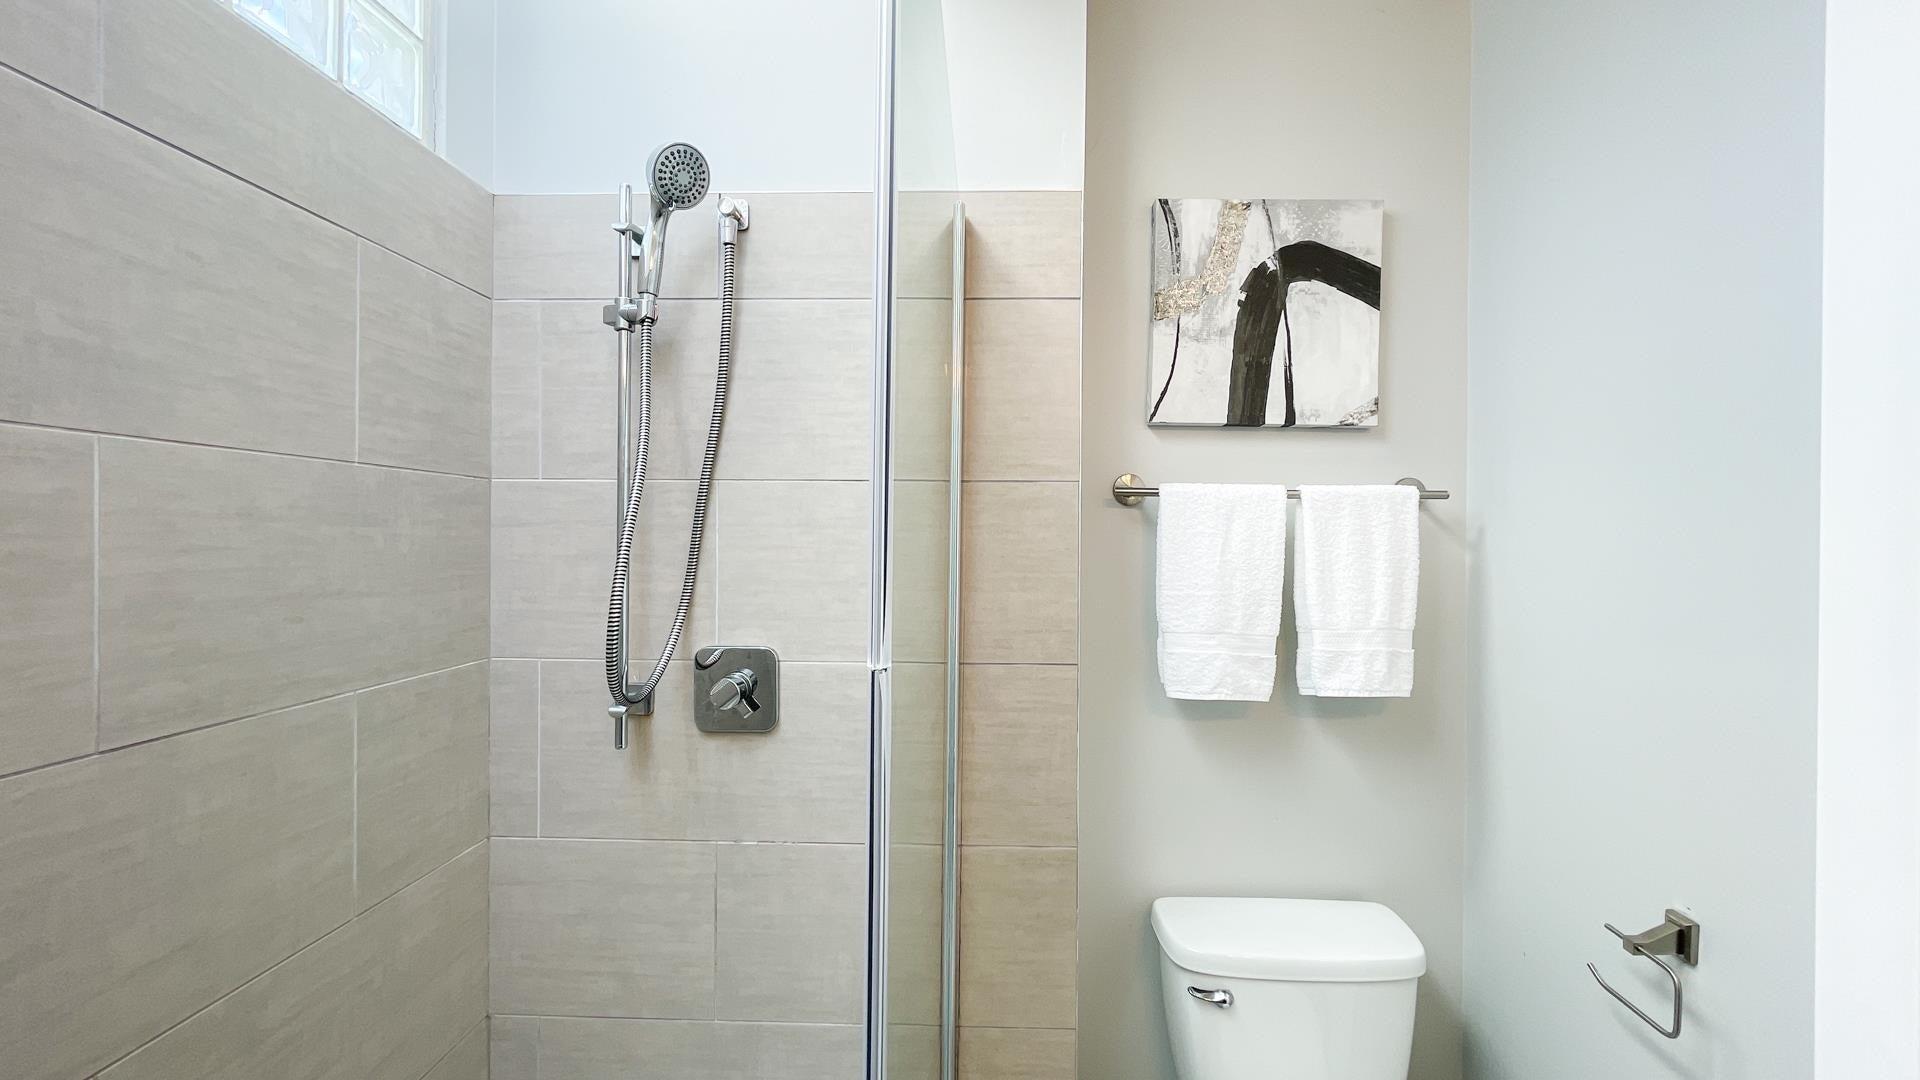 1168 JEFFERSON AVENUE - Ambleside House/Single Family for sale, 6 Bedrooms (R2602275) - #18